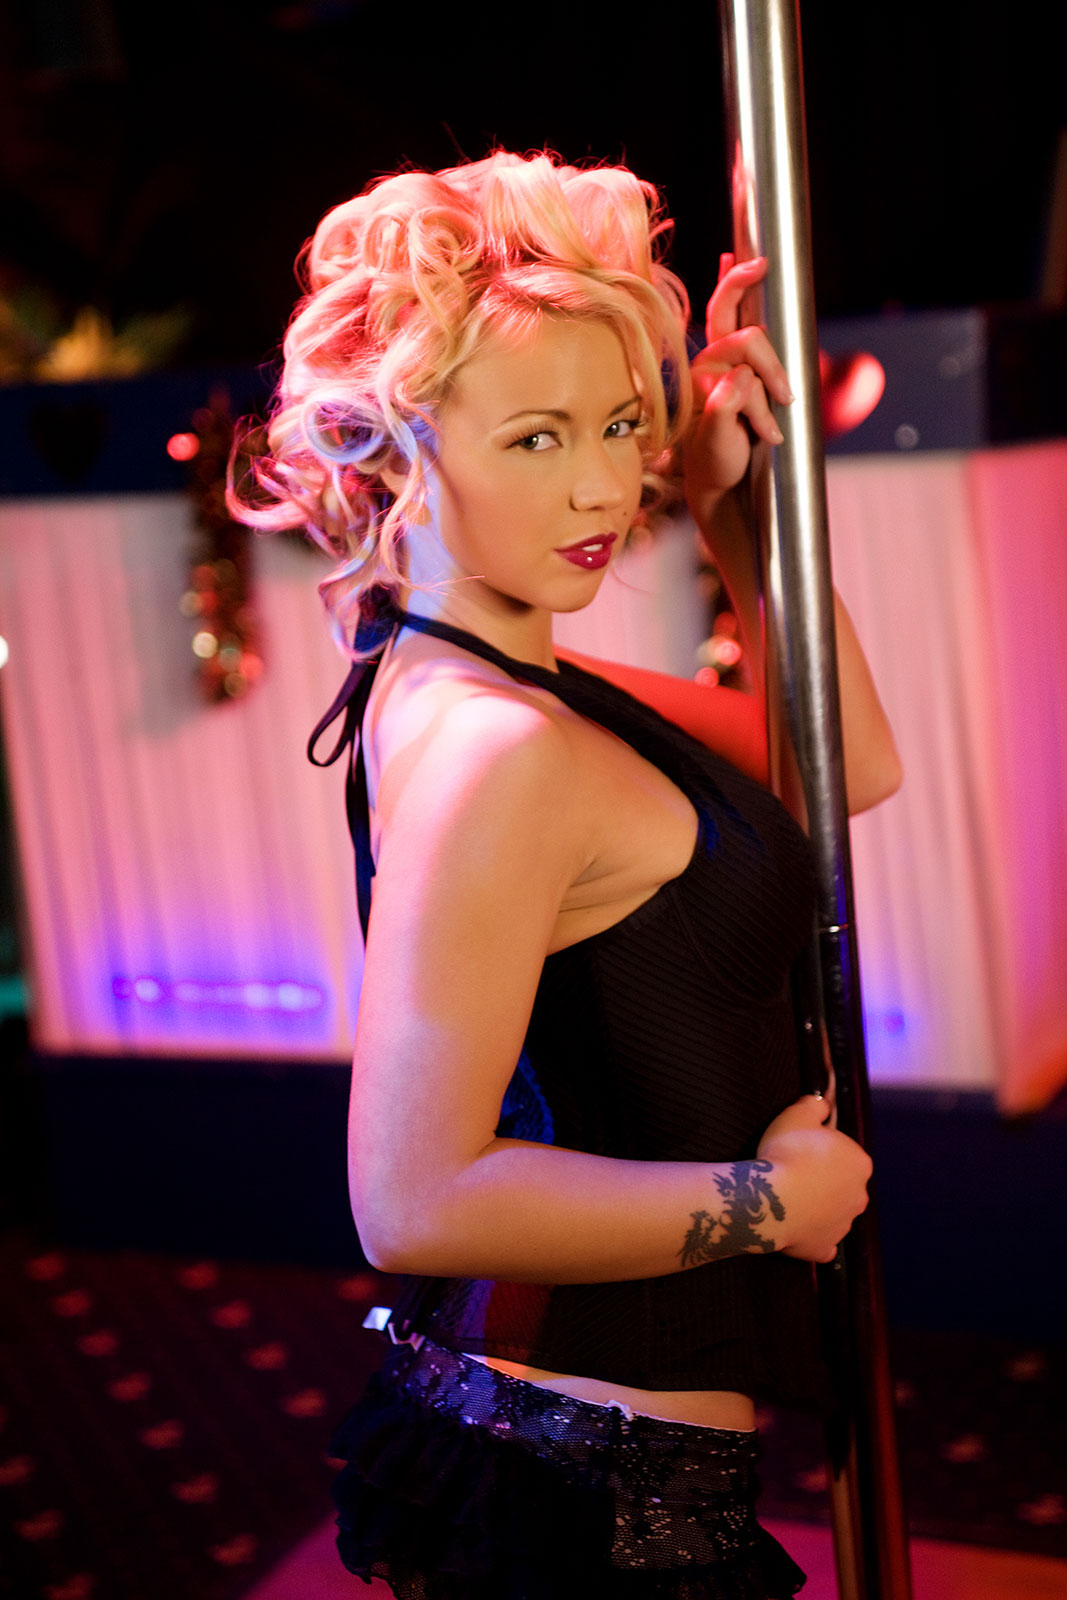 Sexy Blonde Robin Truelove Vs The Strip Pole 4543-7700